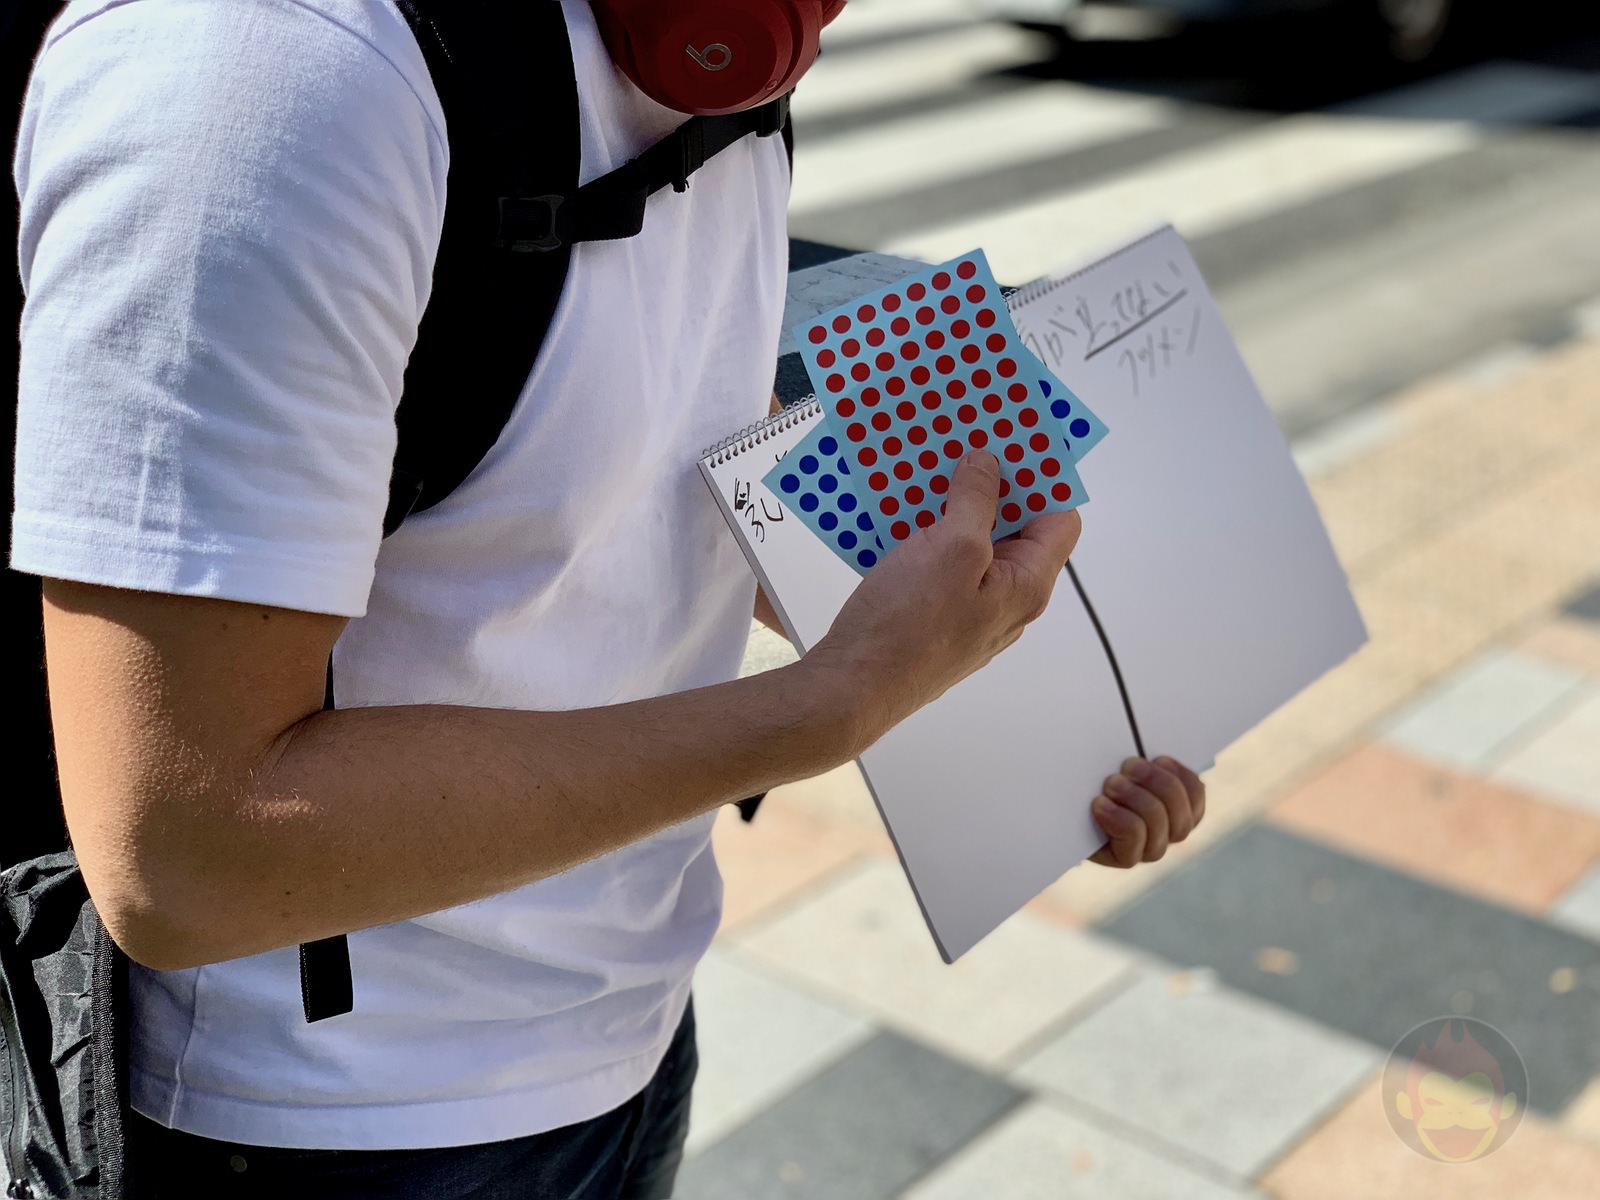 White-Tshirt-Questionare-at-Shibuya-Harajuku-03.jpg